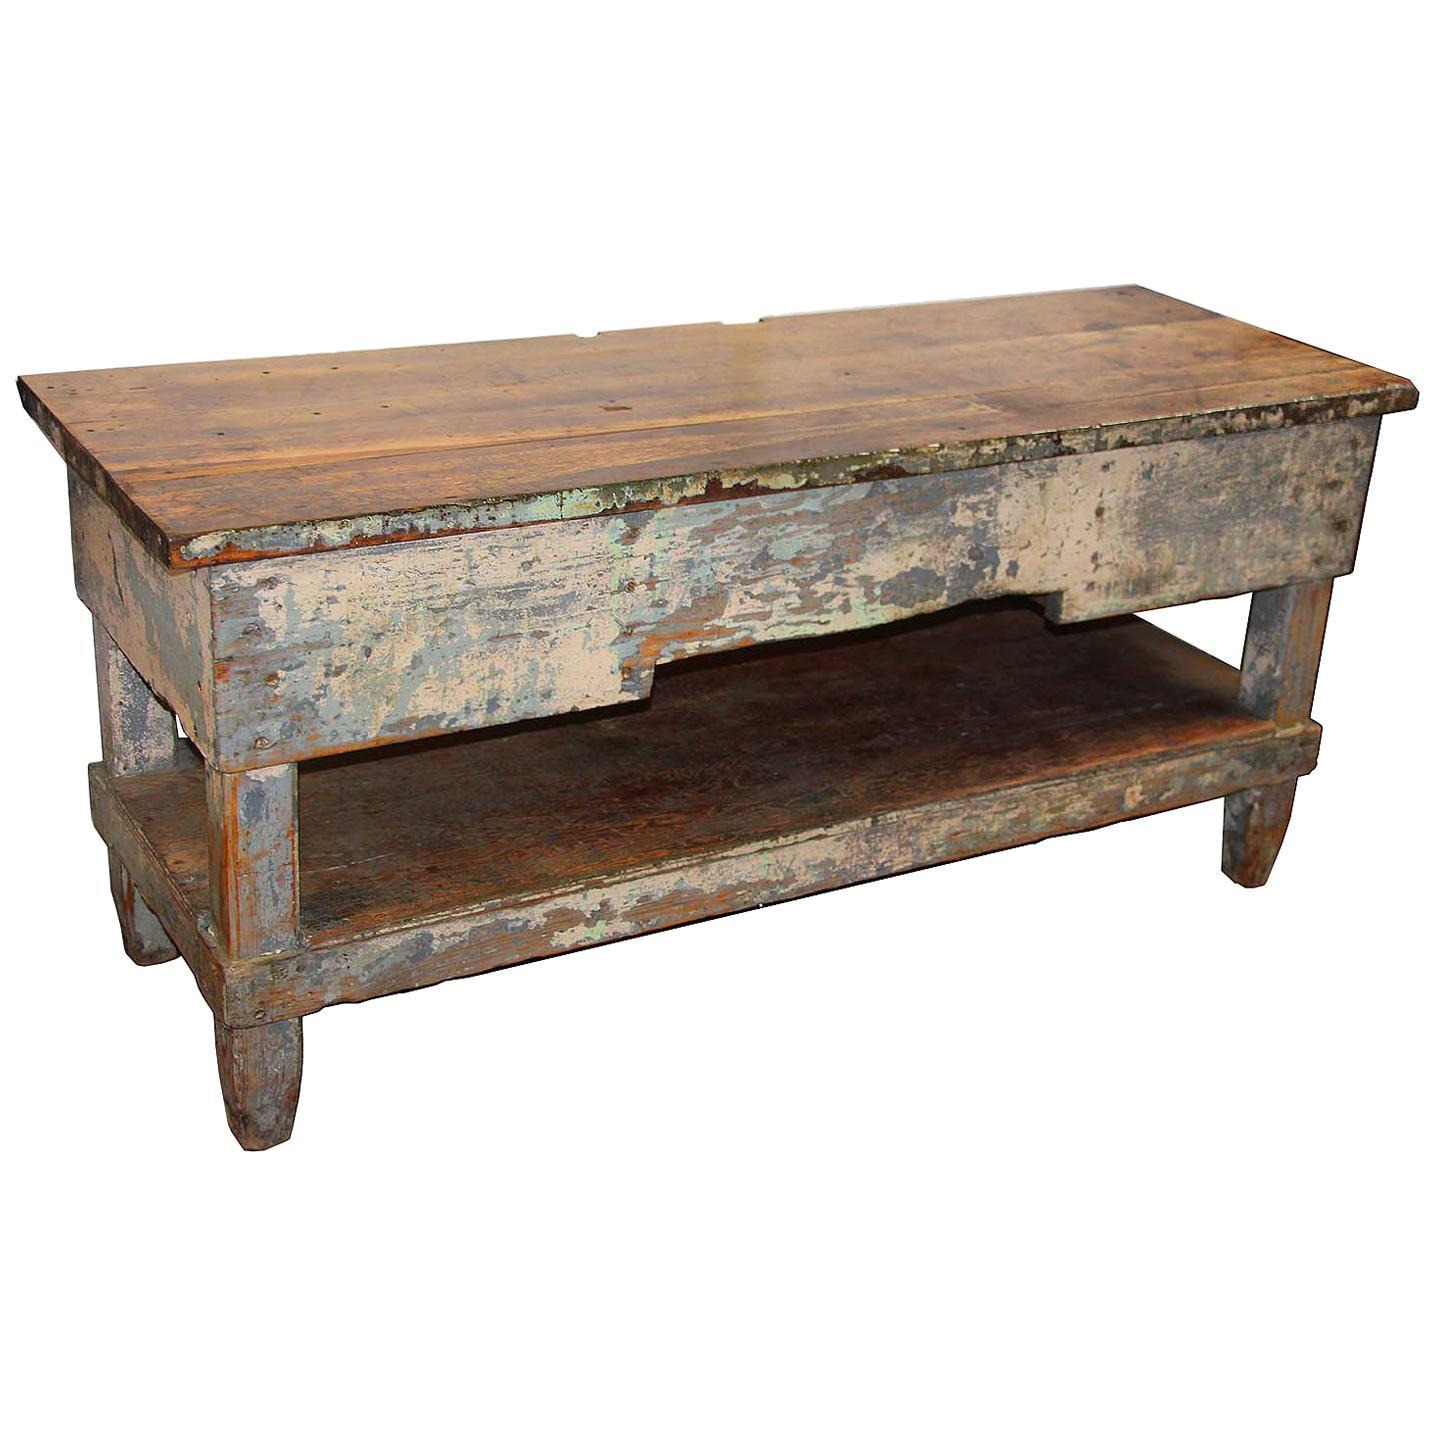 Ordinaire Primitive Antique Work Bench Or Console For Sale